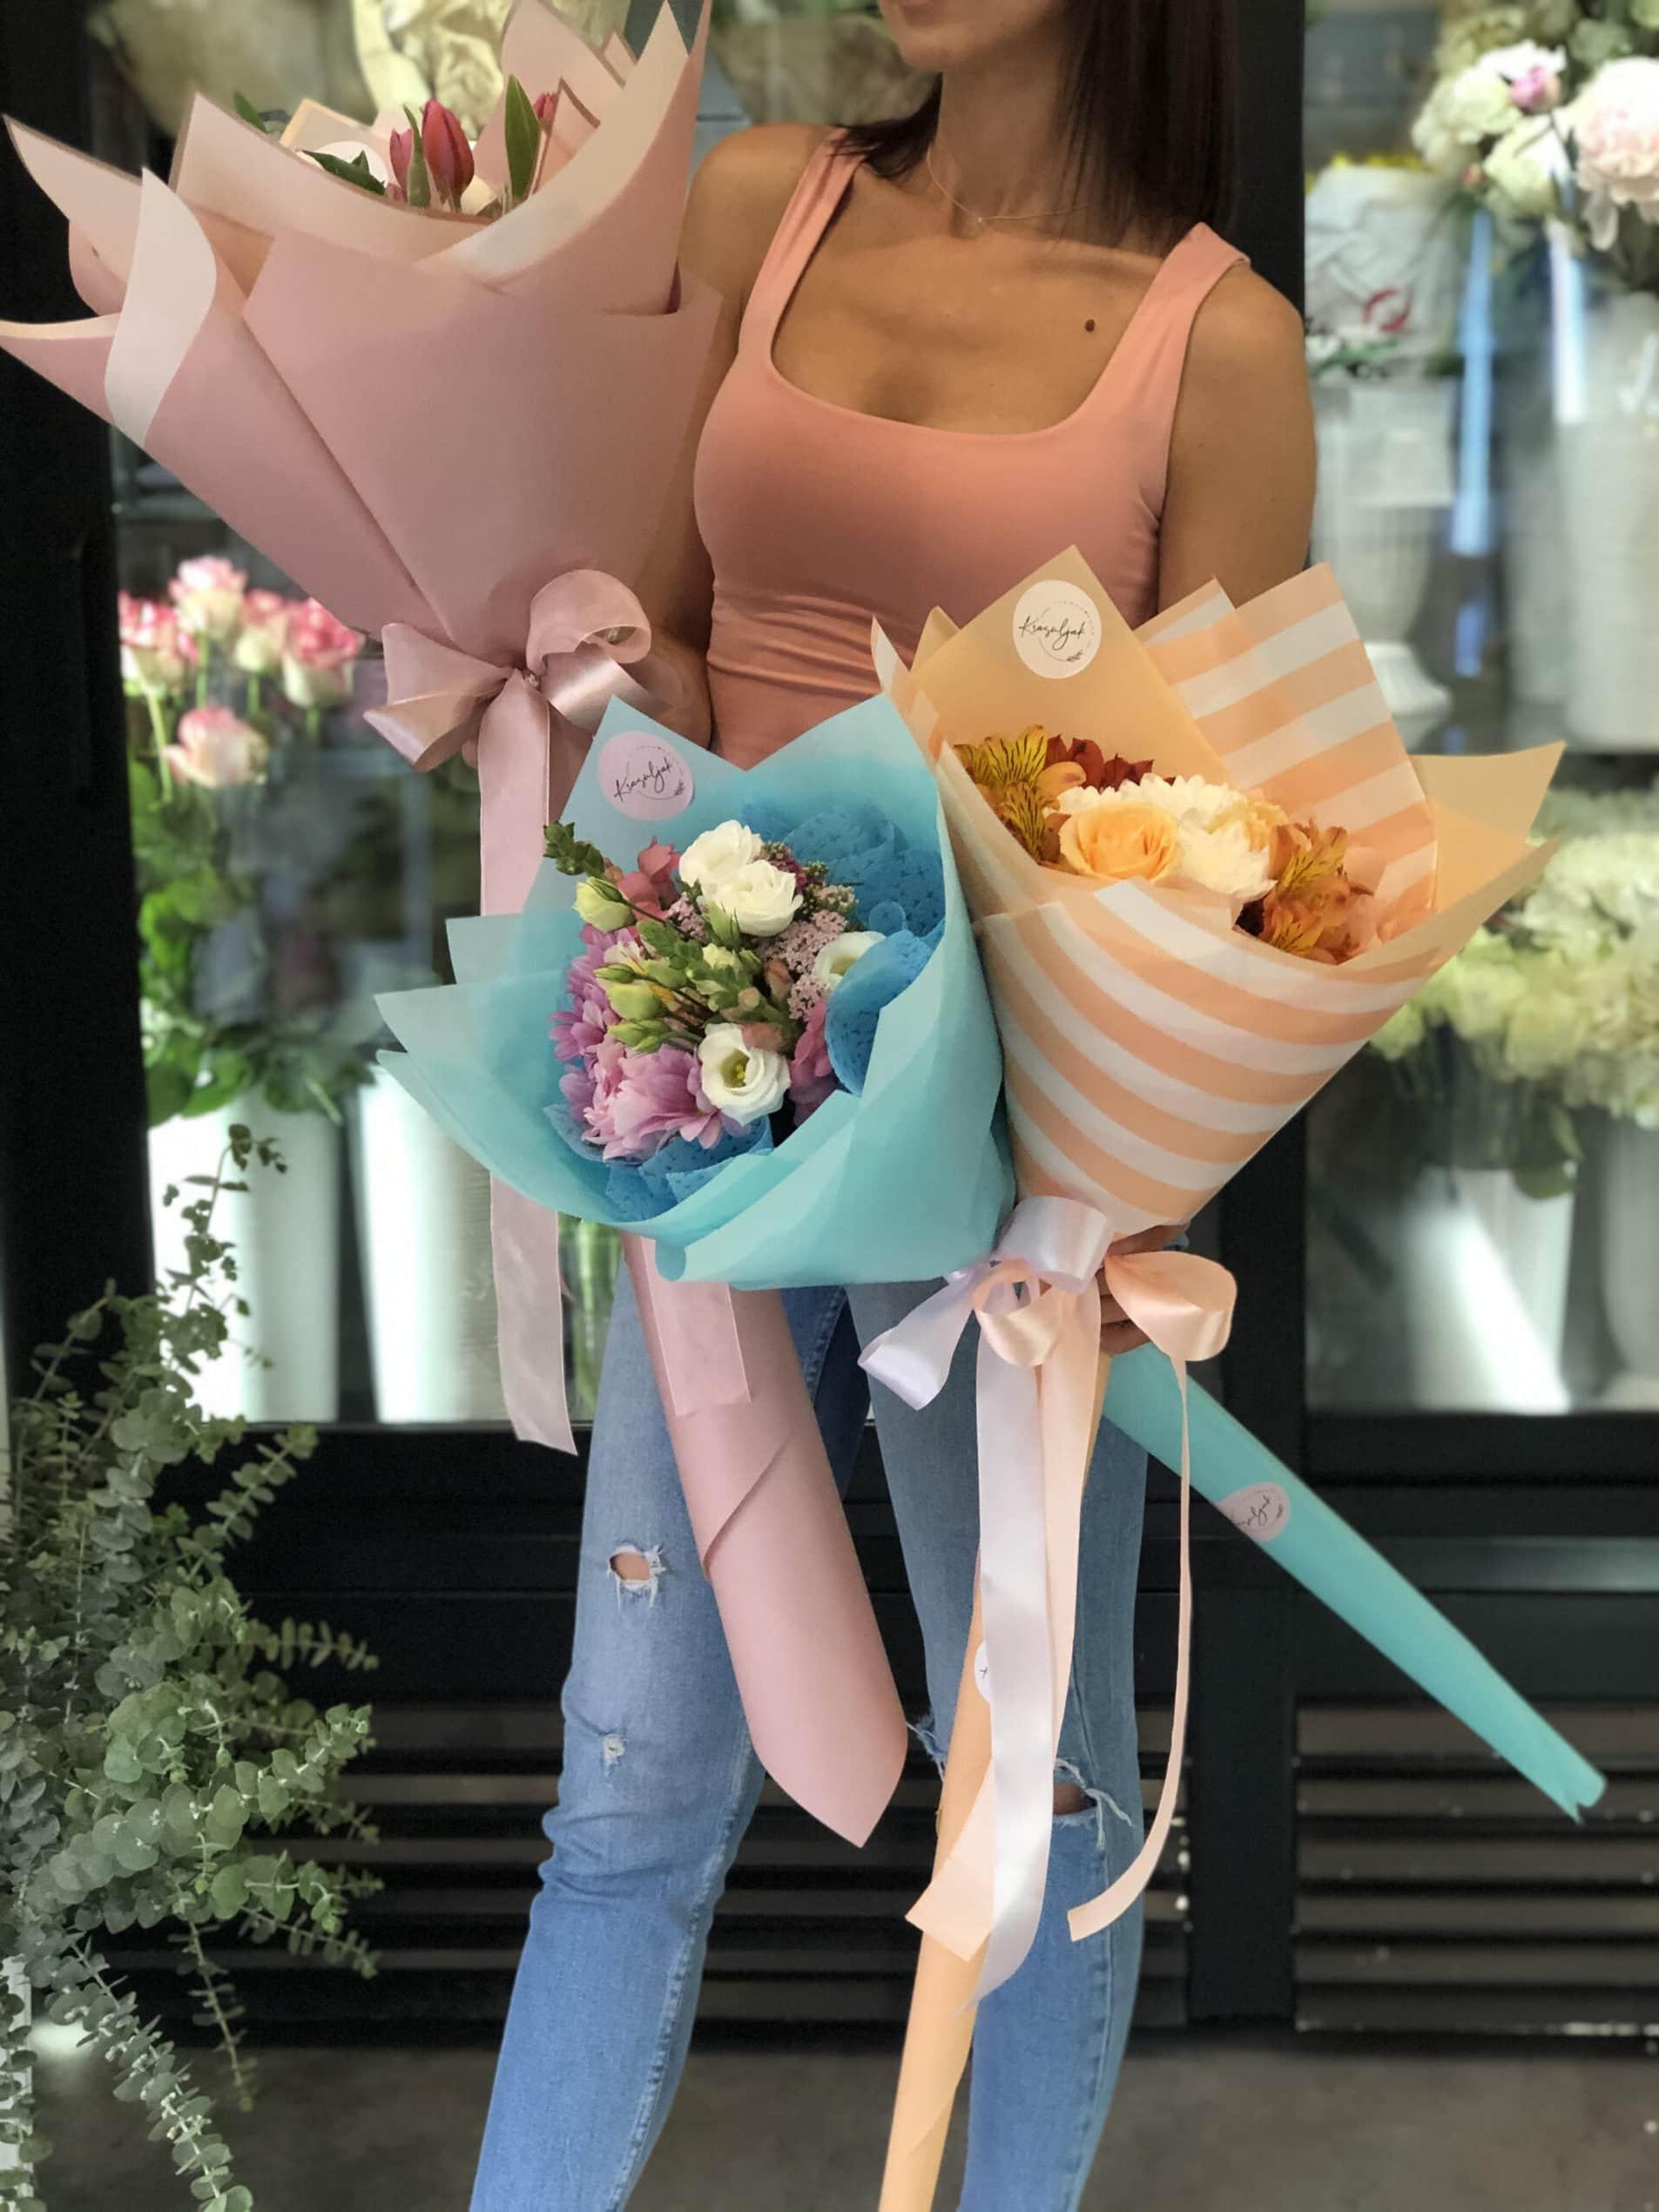 Cvece - plavi papir ukrasni, narandzasto beli ukrasni papir, cvecara novi sad, rozi papir